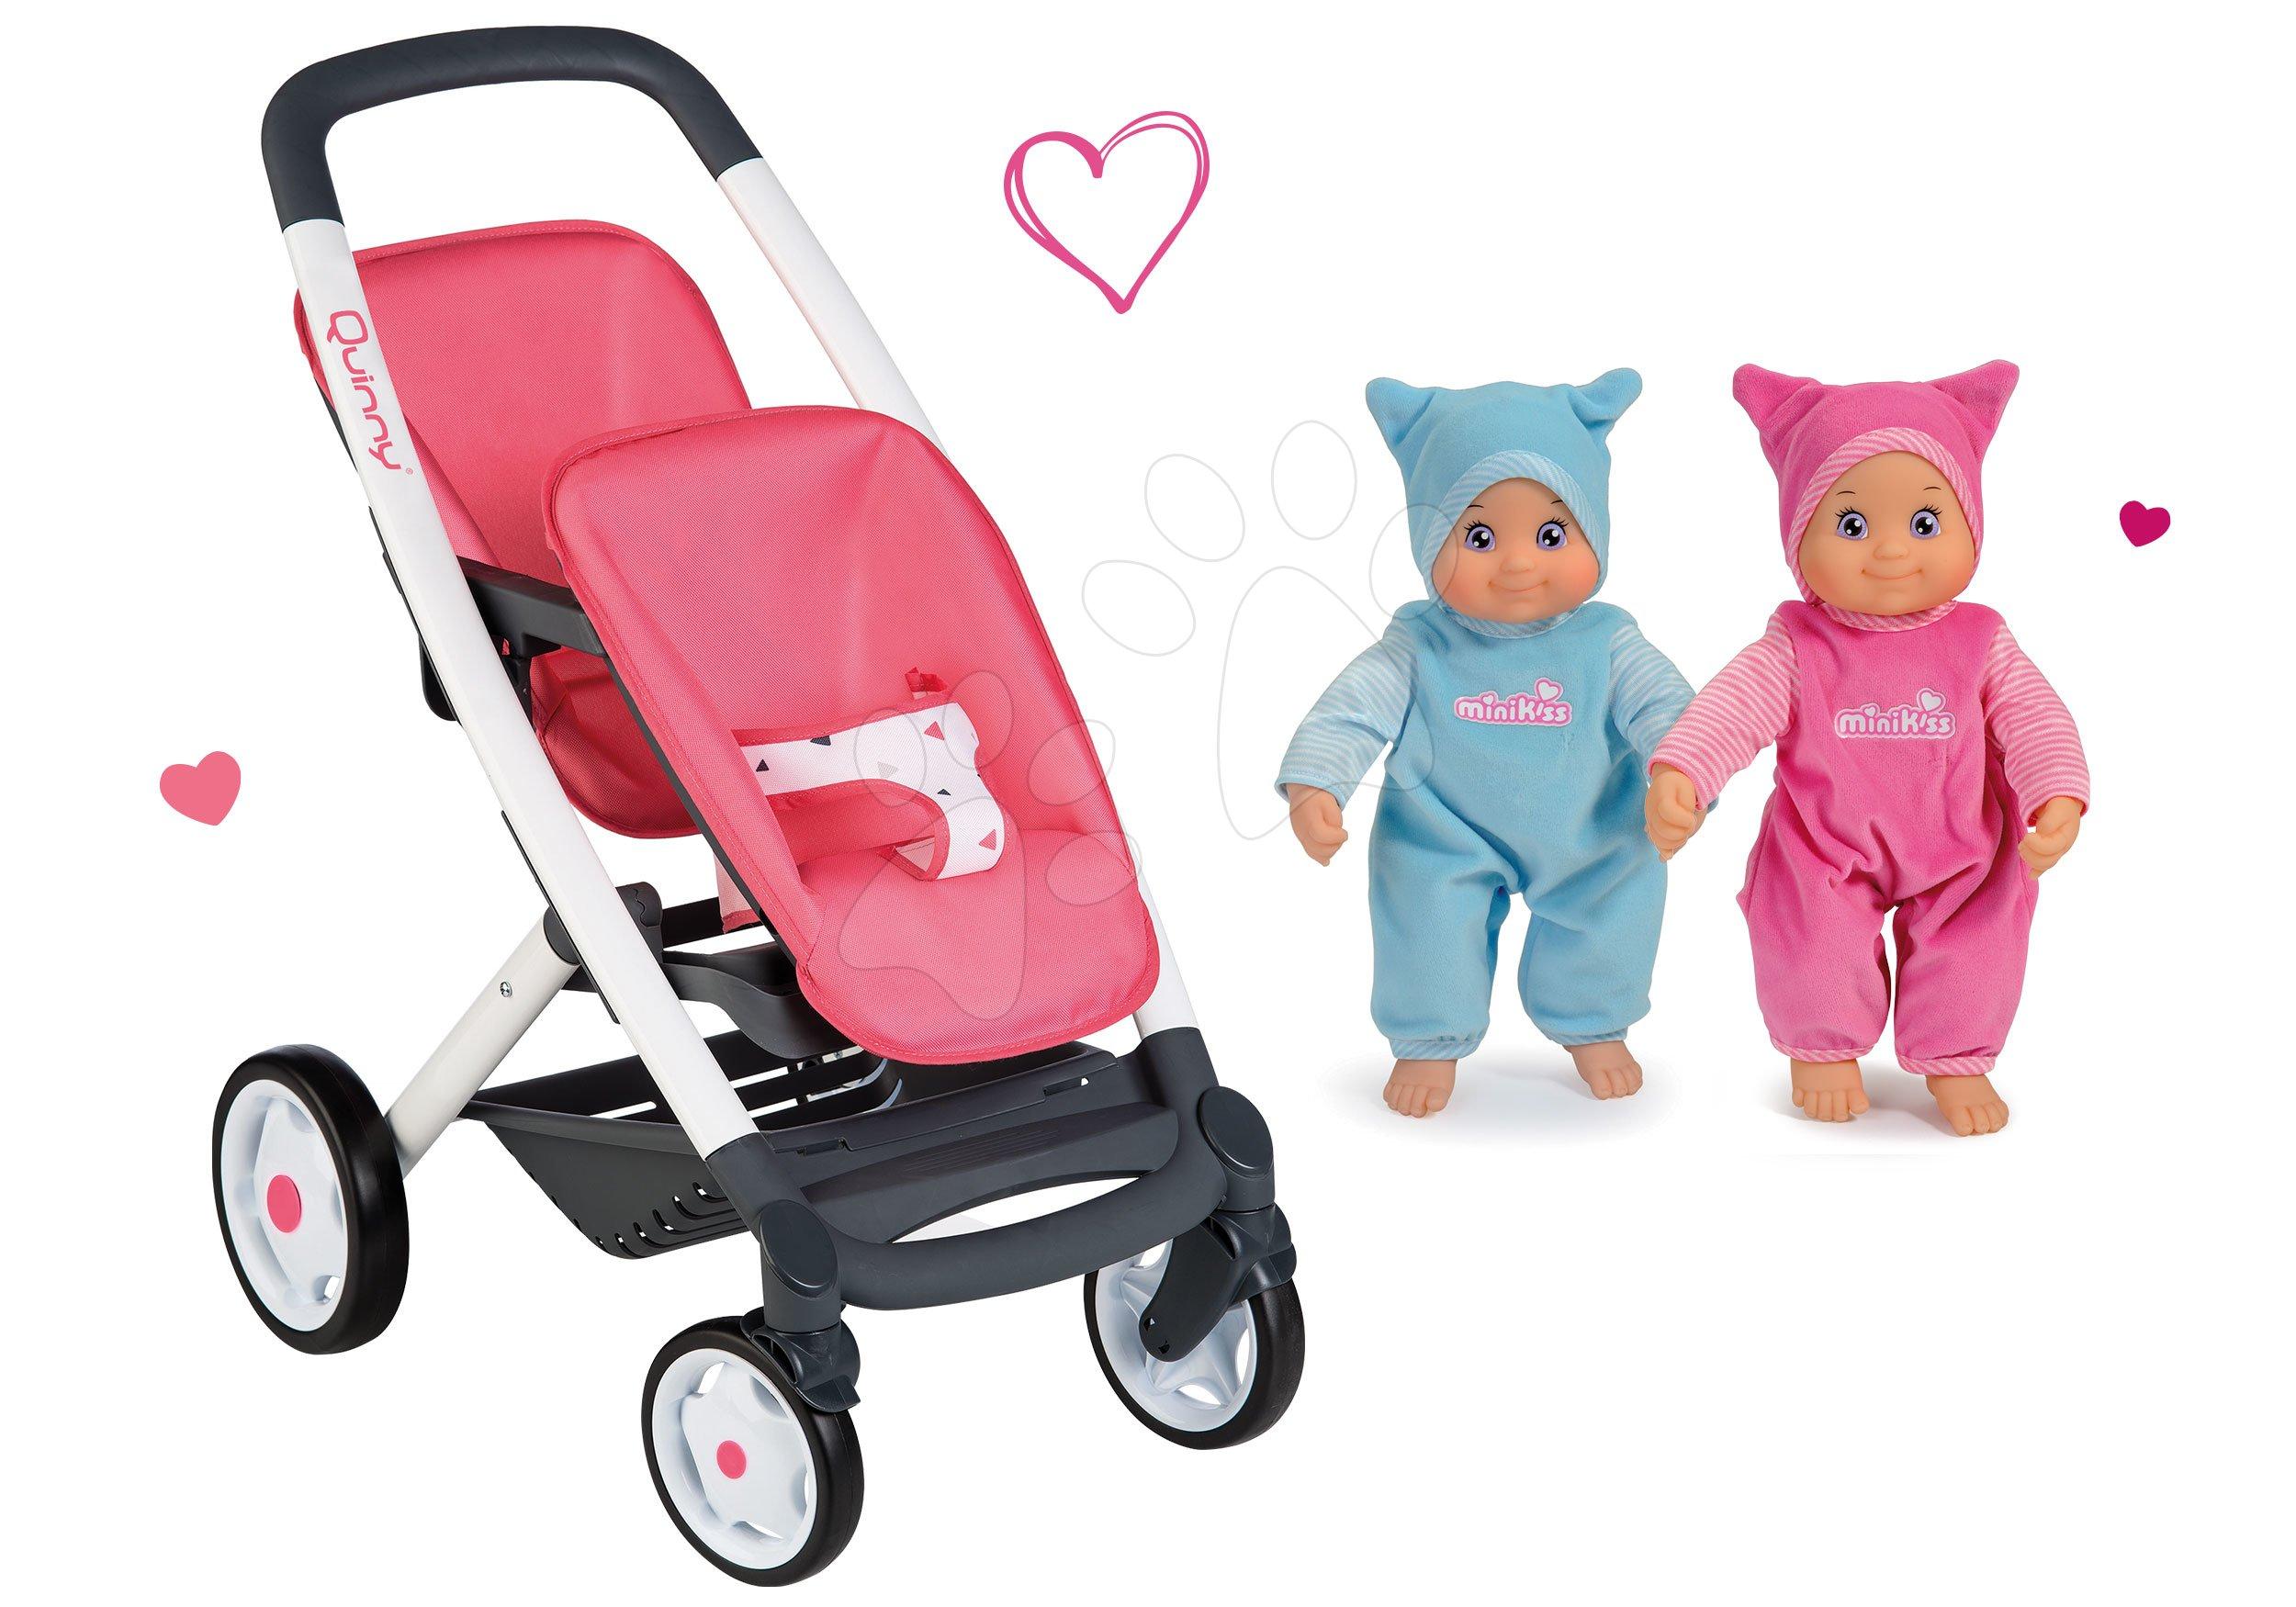 Set kočárek pro dvě panenky Twin Trio Pastel Maxi Cosi & Quinny Smoby a panenky dvojčata MiniKiss se